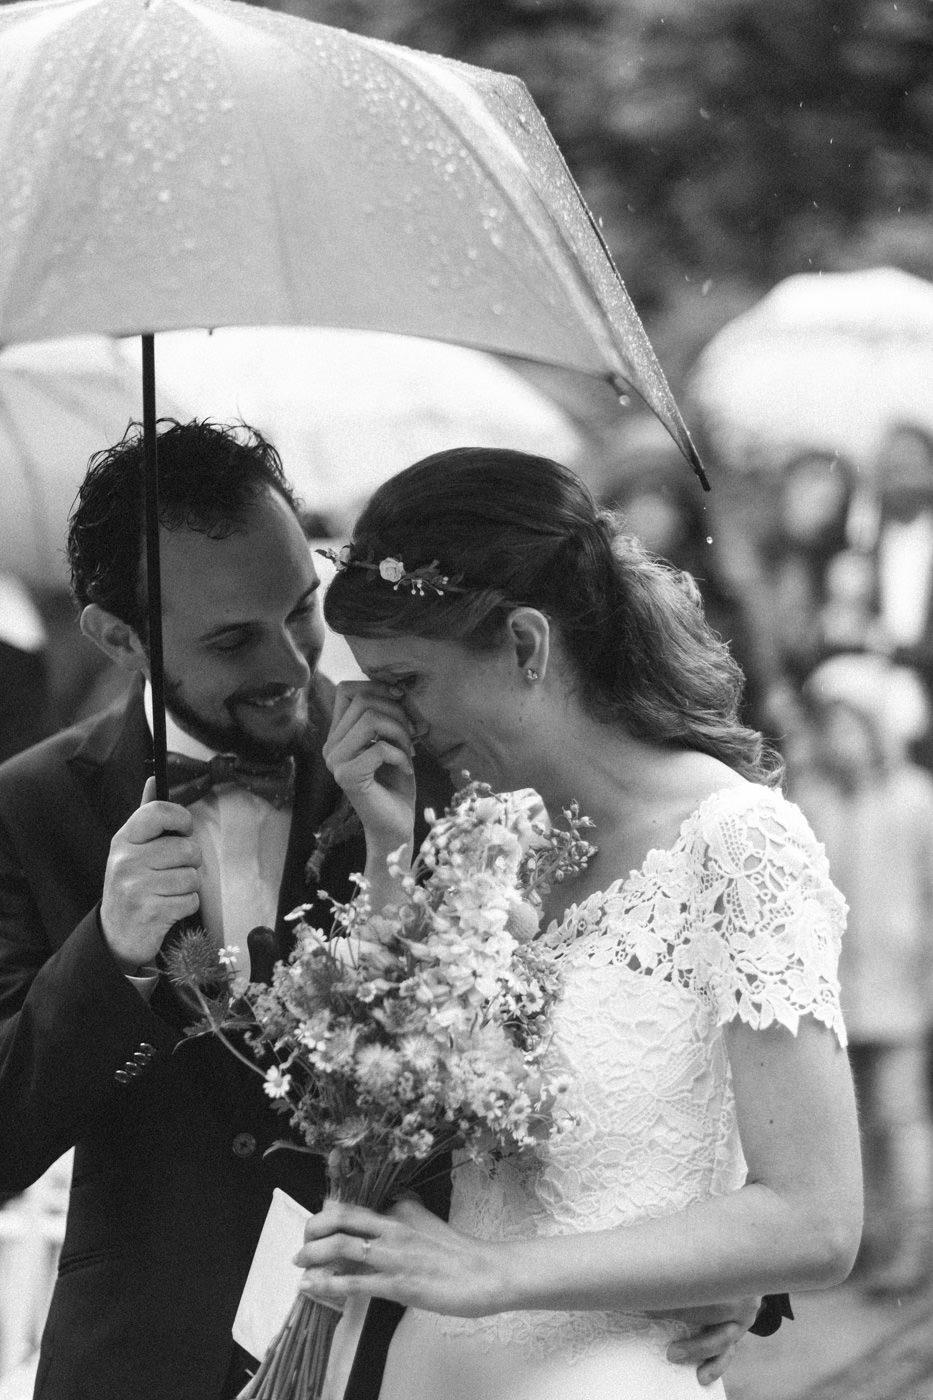 matrimoni_all_italiana_fotografo_matrimonio_toscana-31.jpg